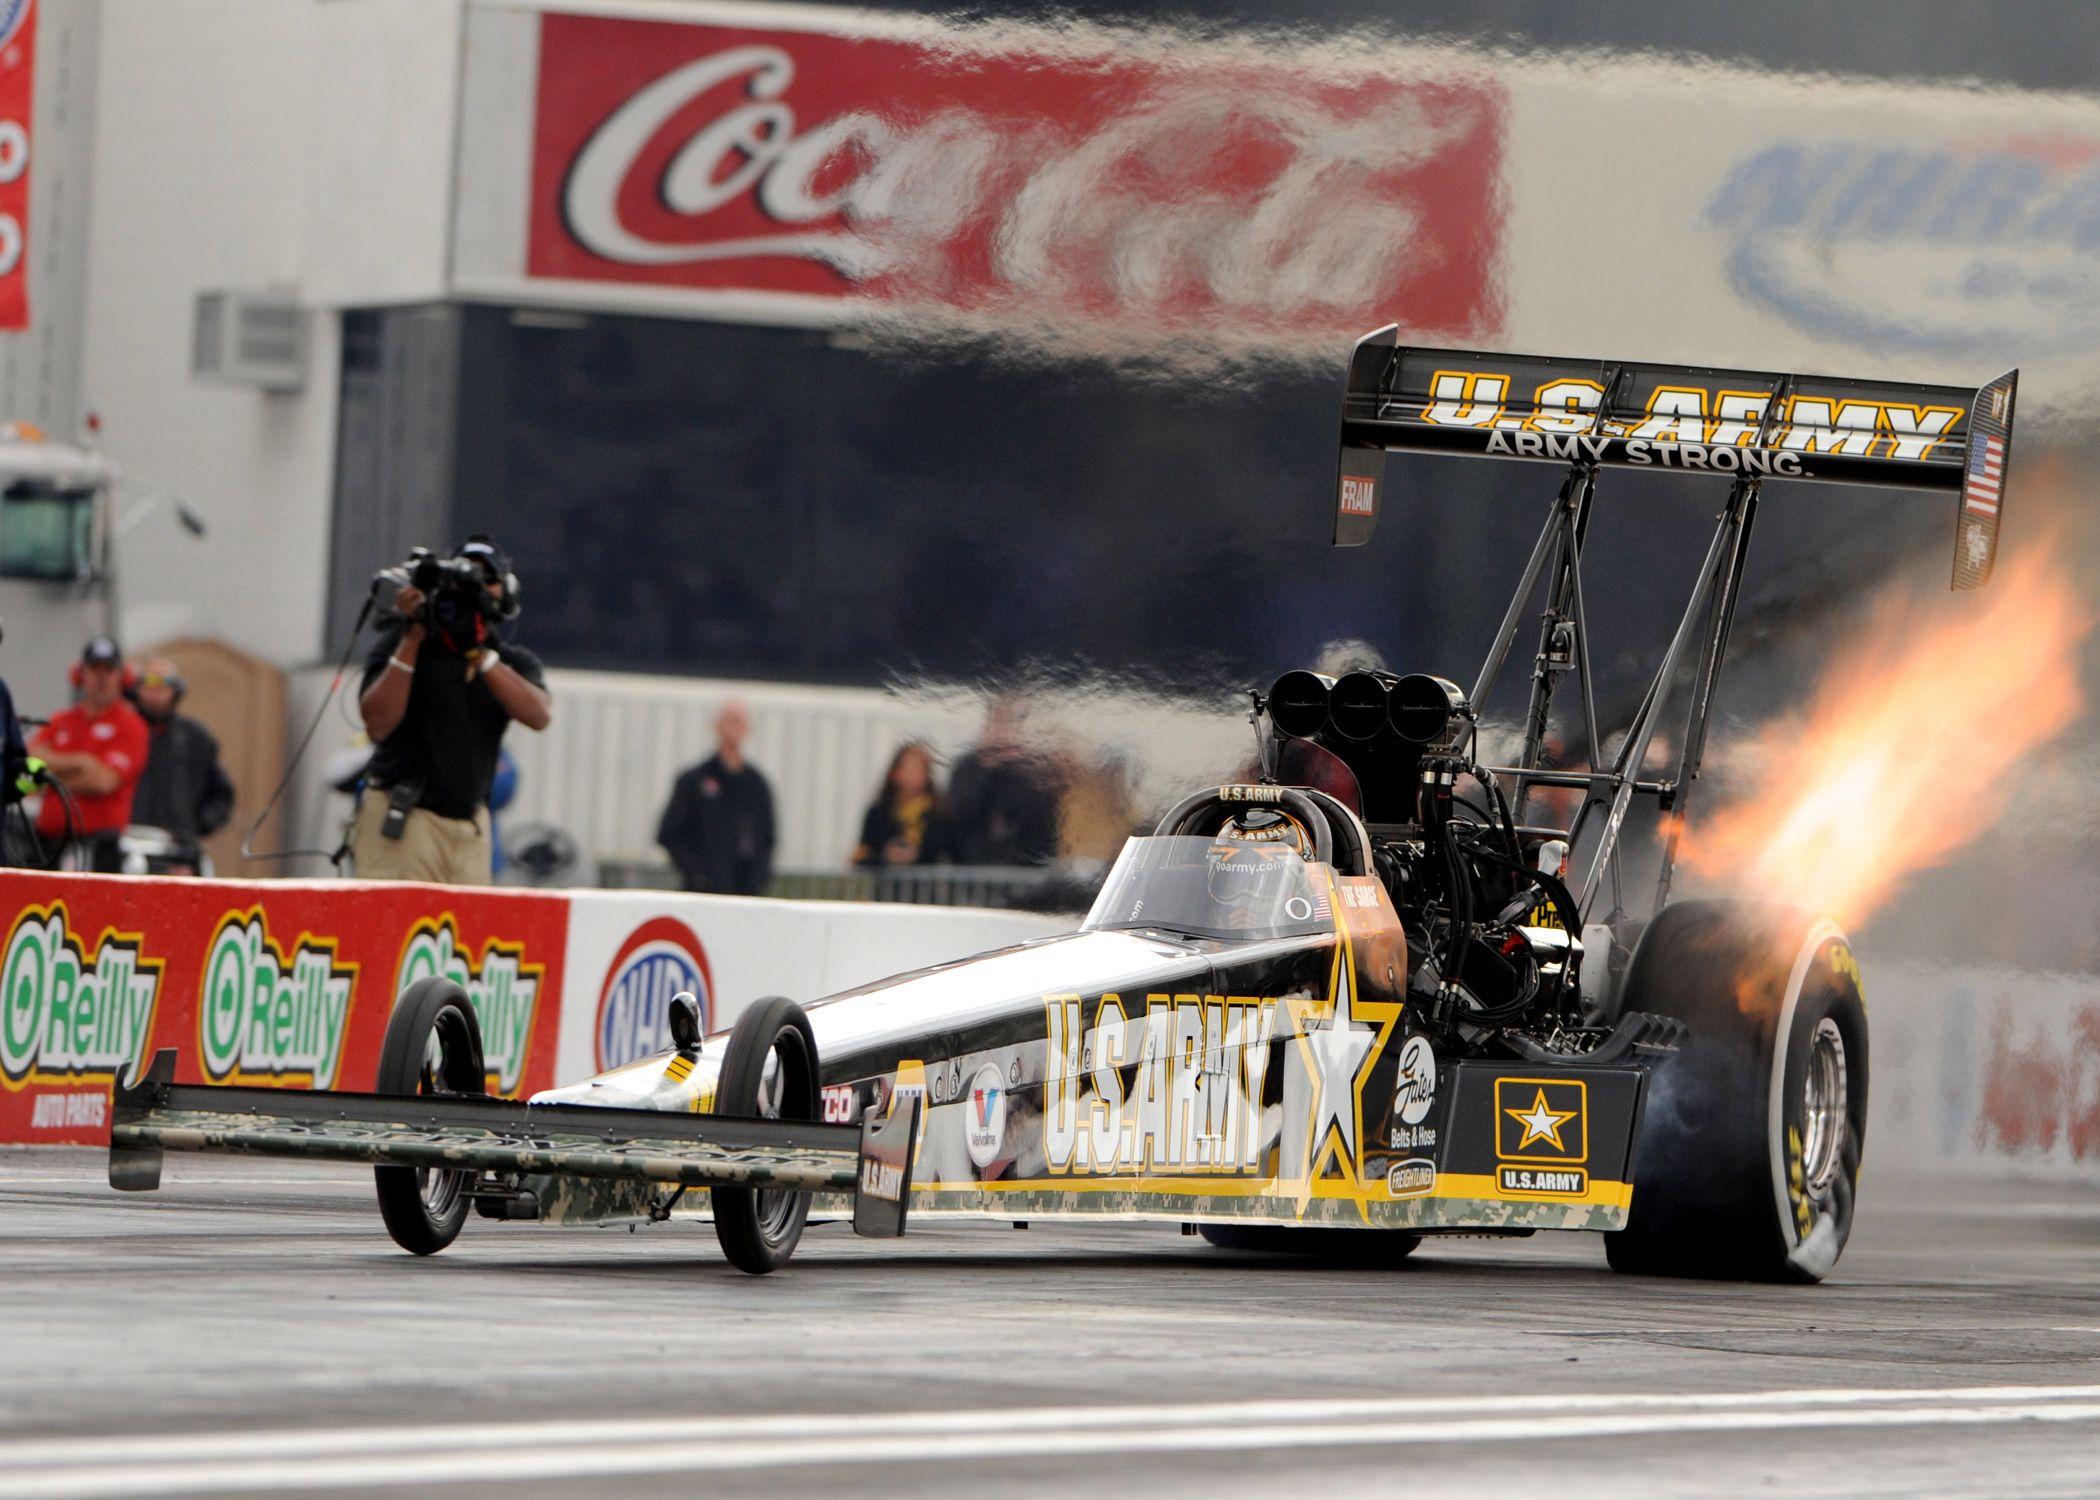 Top Fuel Dragster nhra drag racing race hot rod rods j